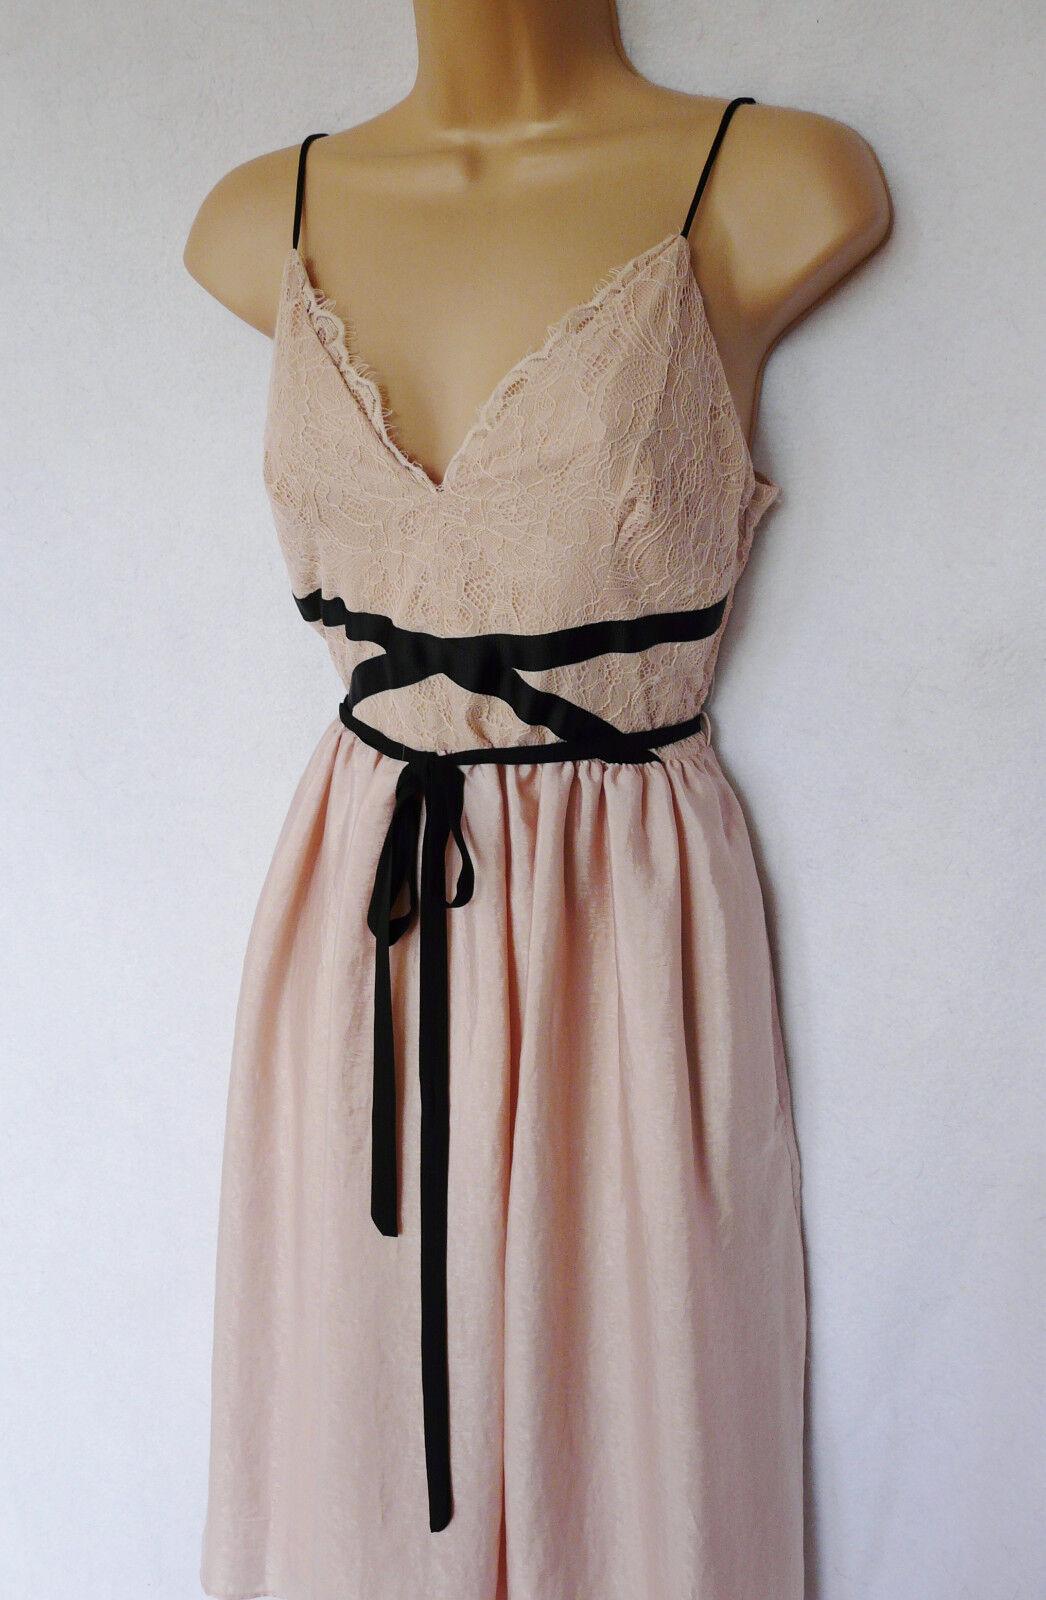 BNWT NEXT bluesh Vintage Pink Tie occasion wedding strappy lace babydoll dress